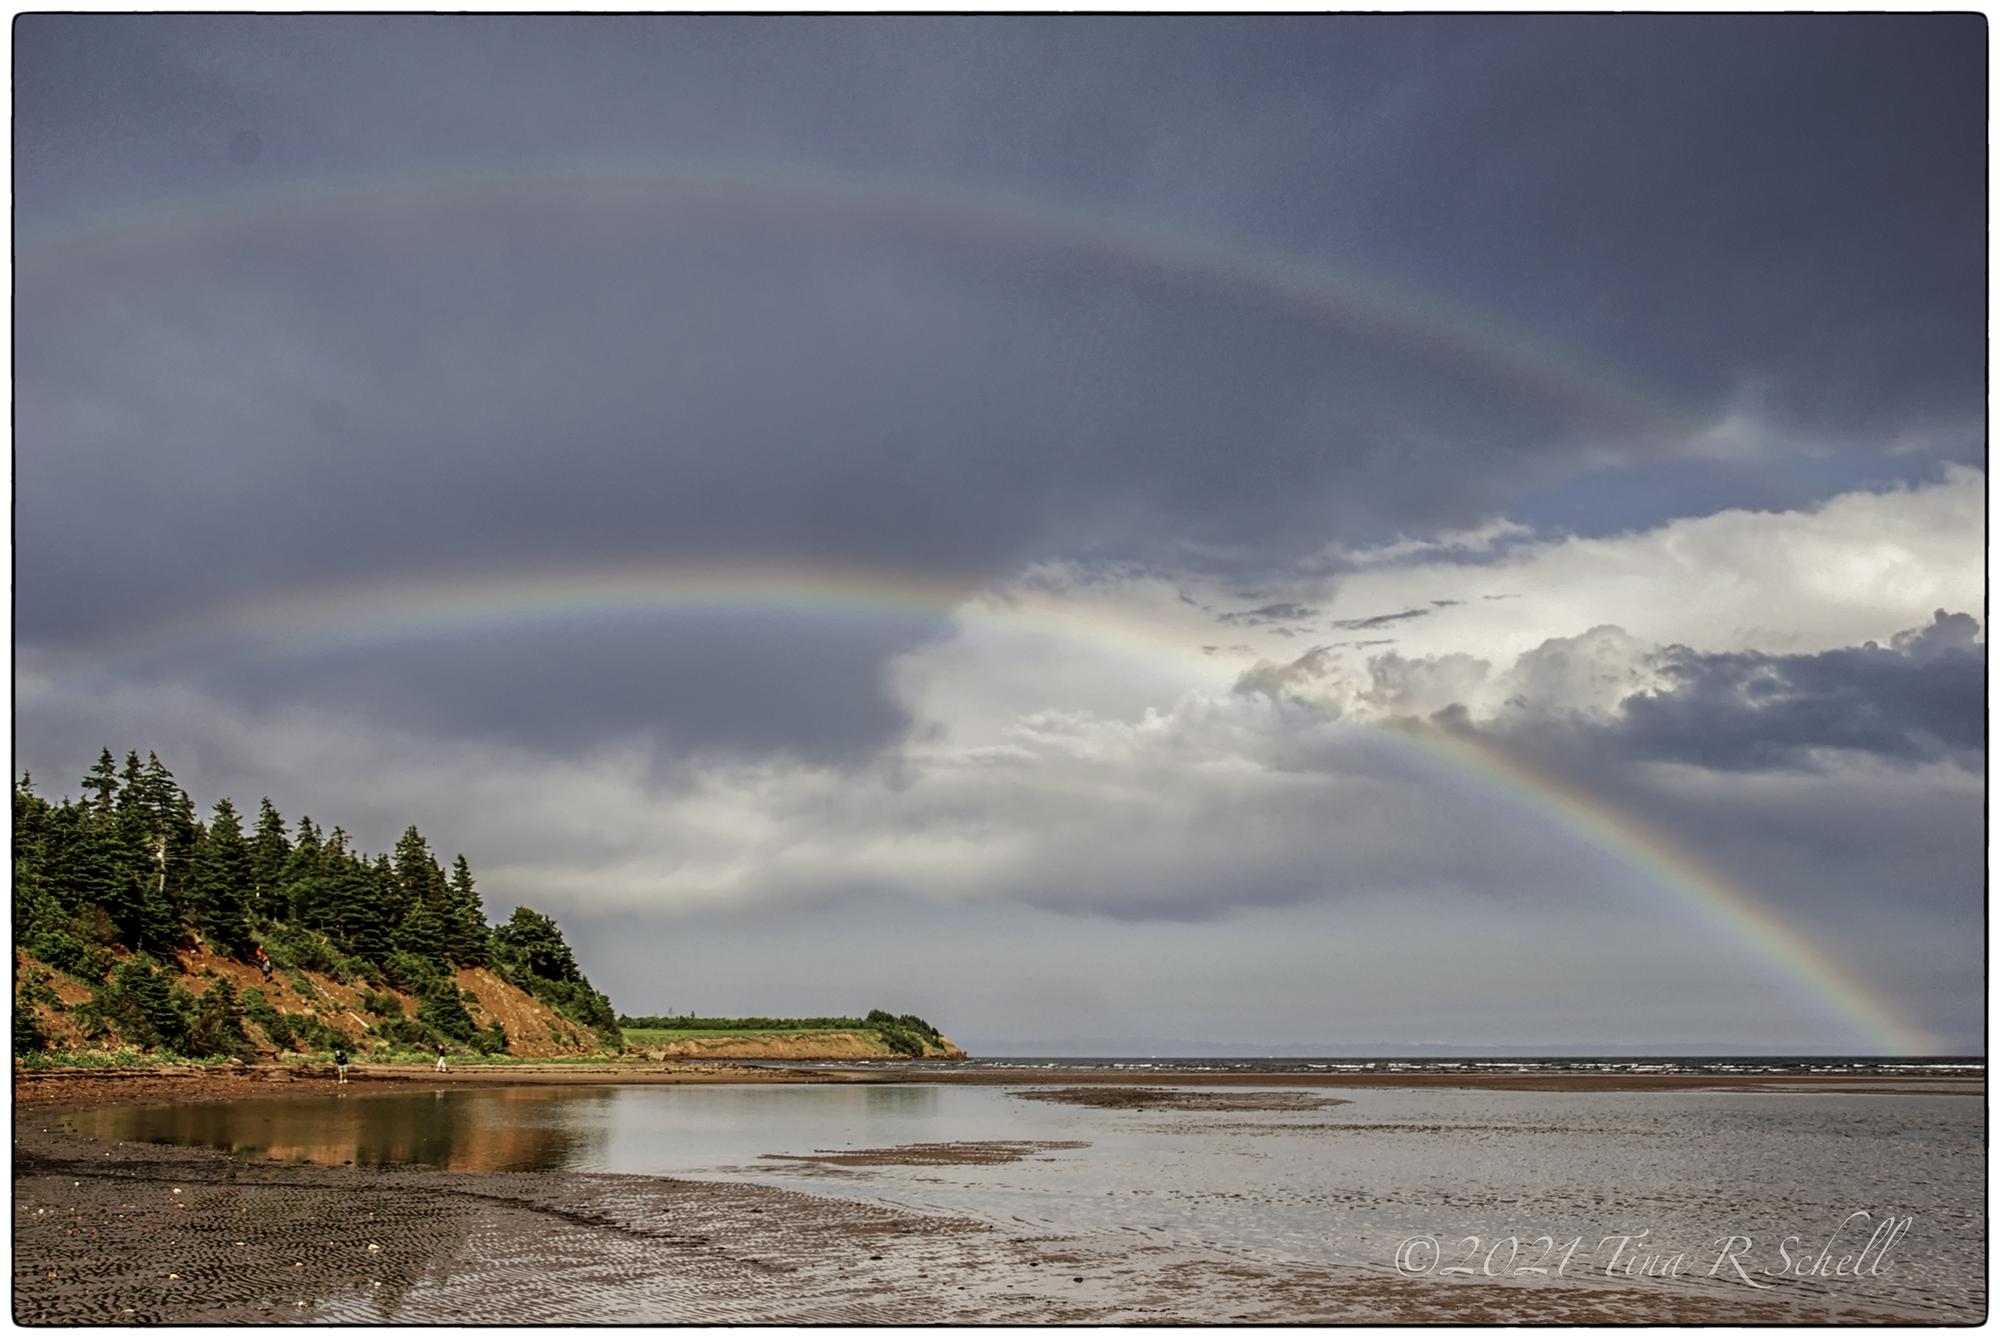 double rainbow, light, storm, clouds